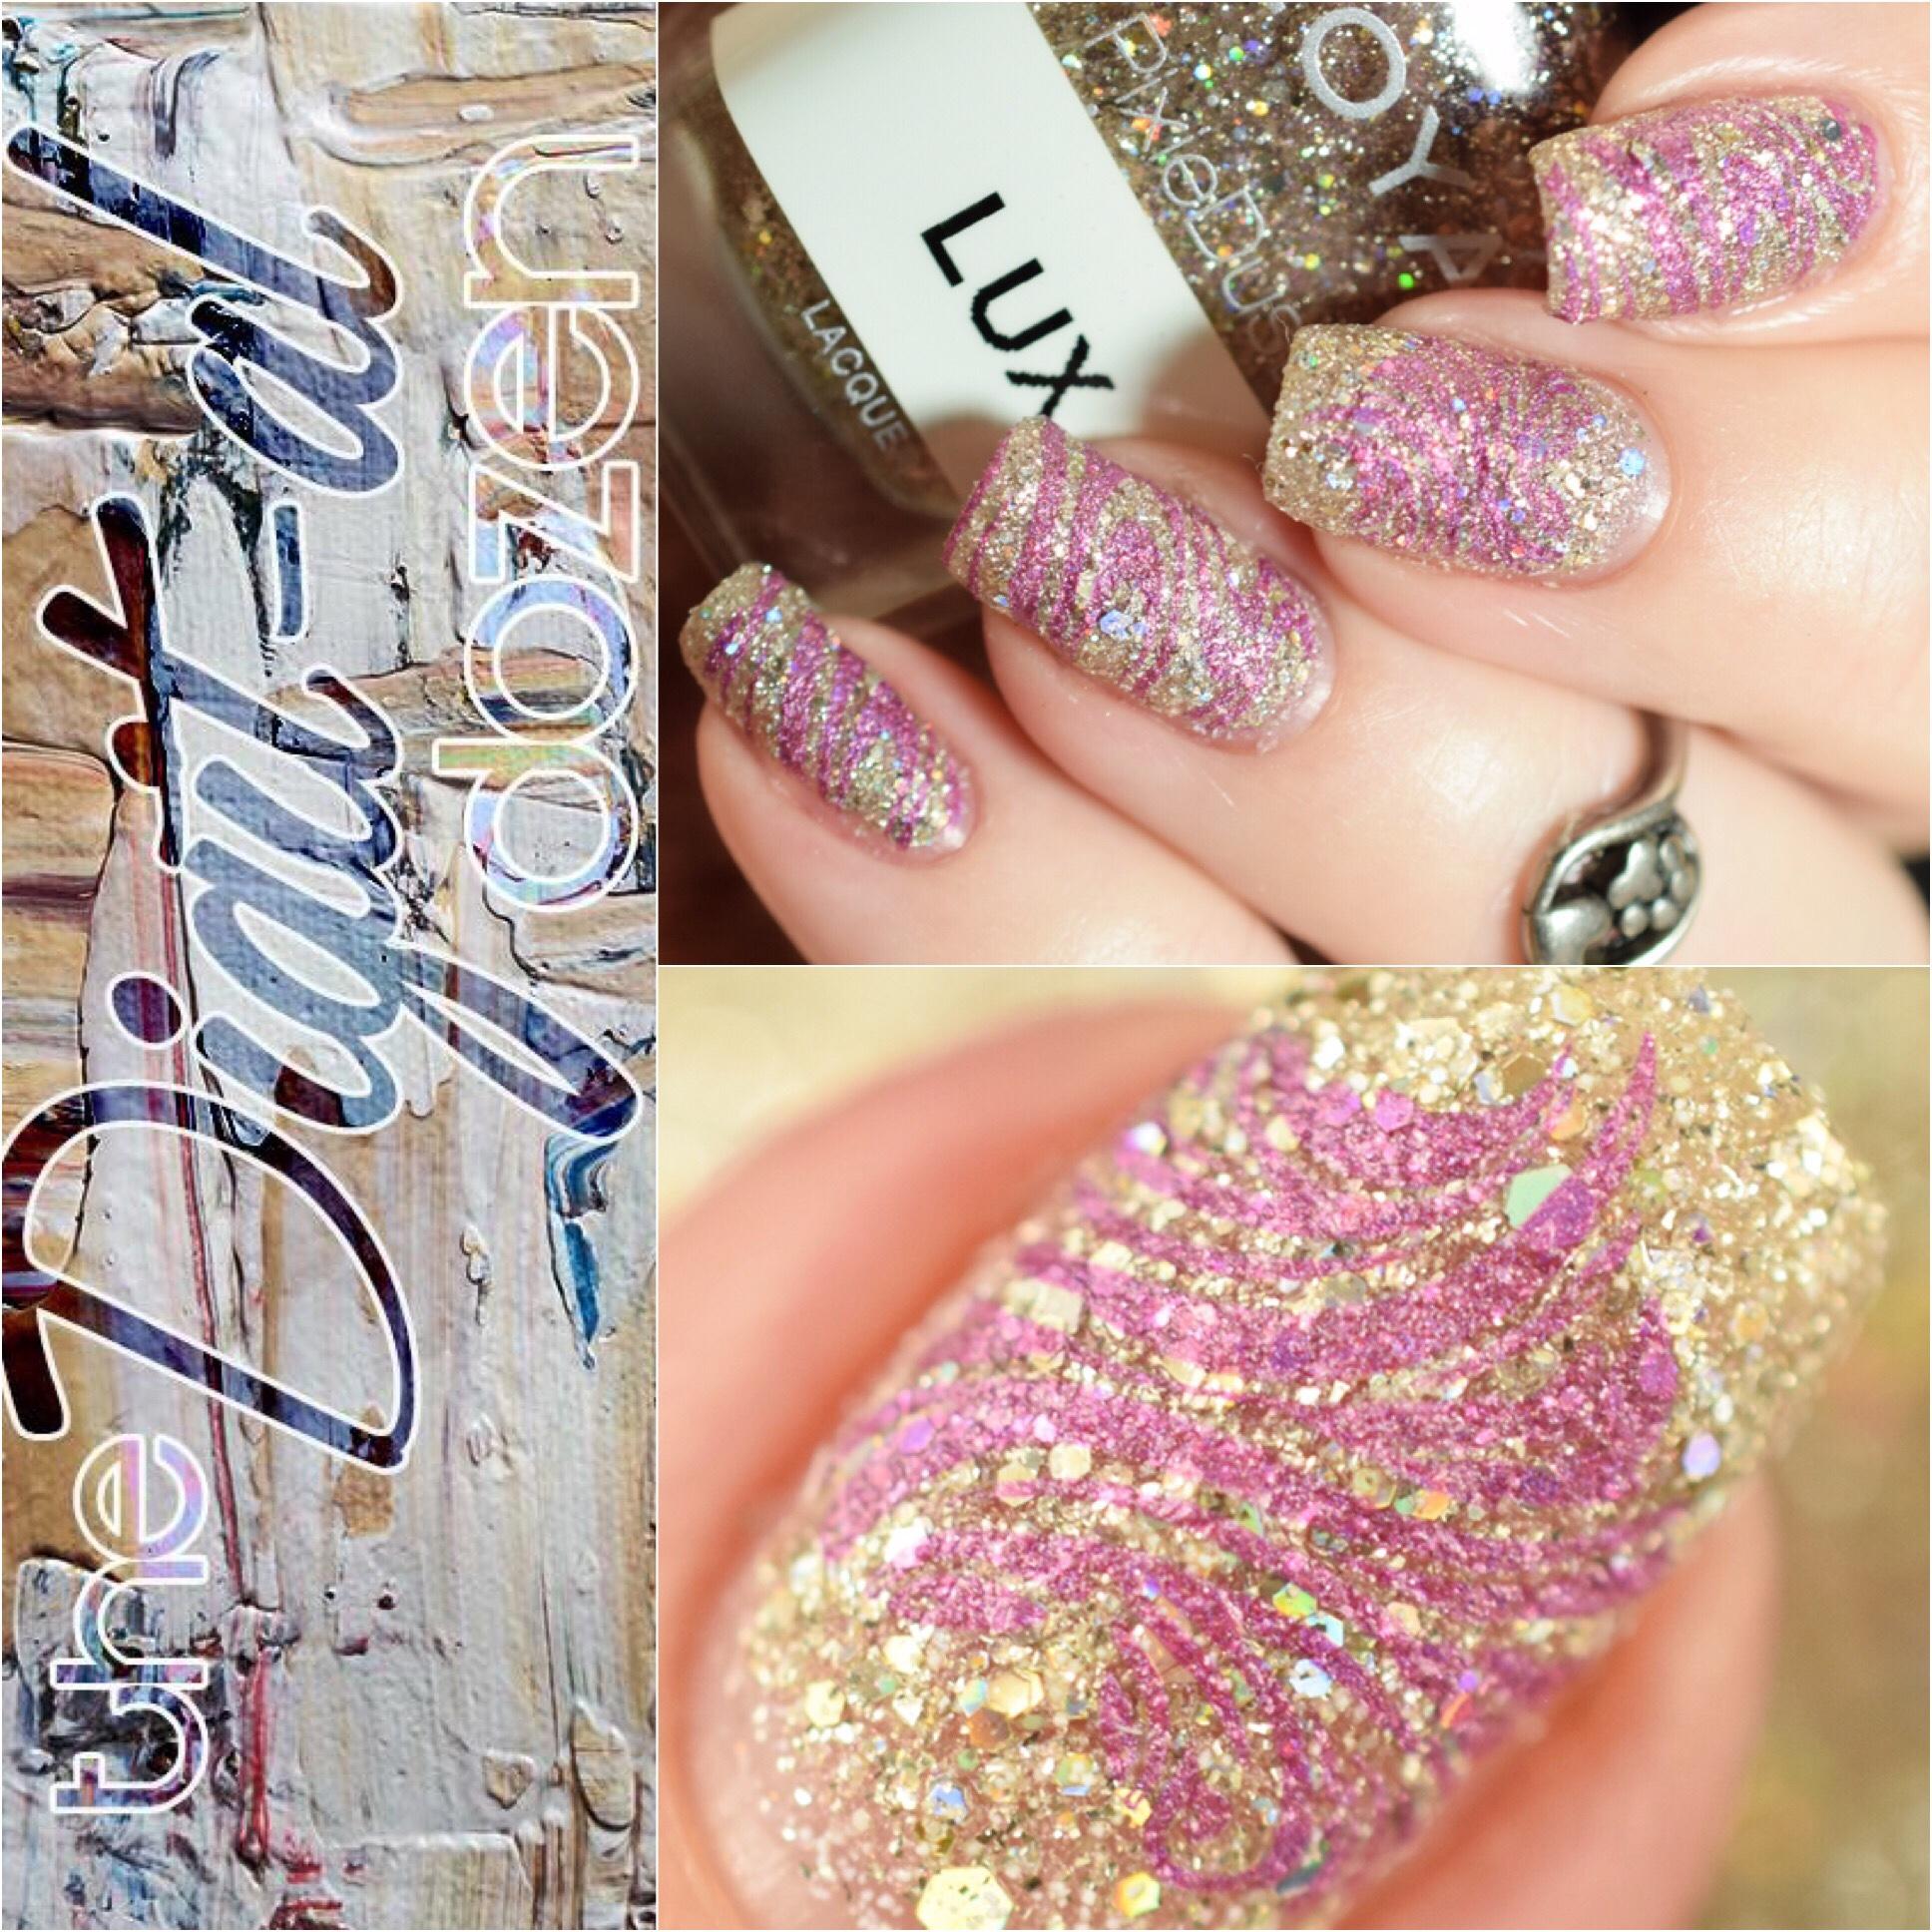 Digit-al Dozen Polish and Paws Textured Valentine's Day Nails